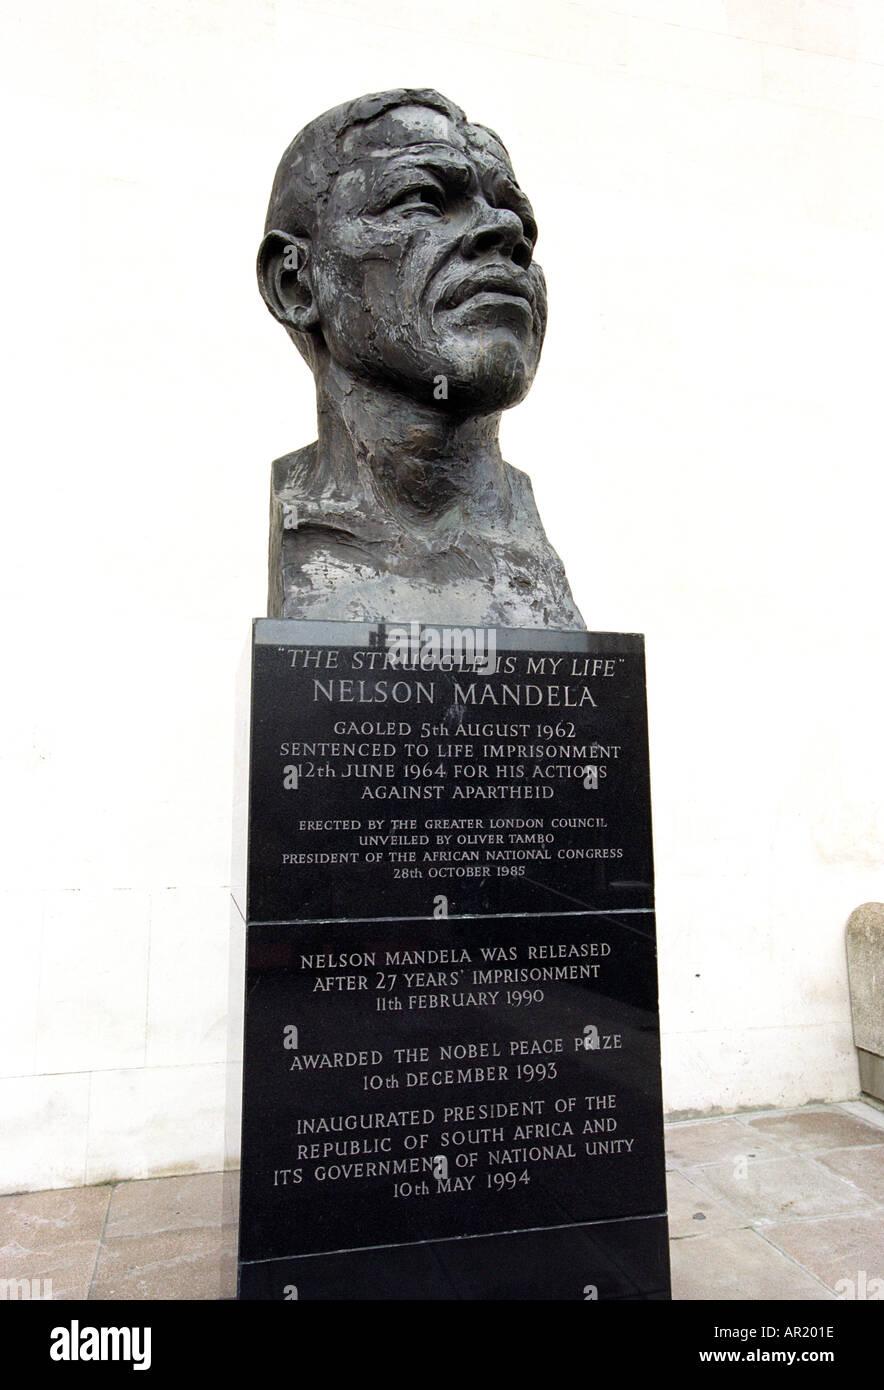 Statue of Nelson Mandela by Hungerford Bridge in London England UK - Stock Image